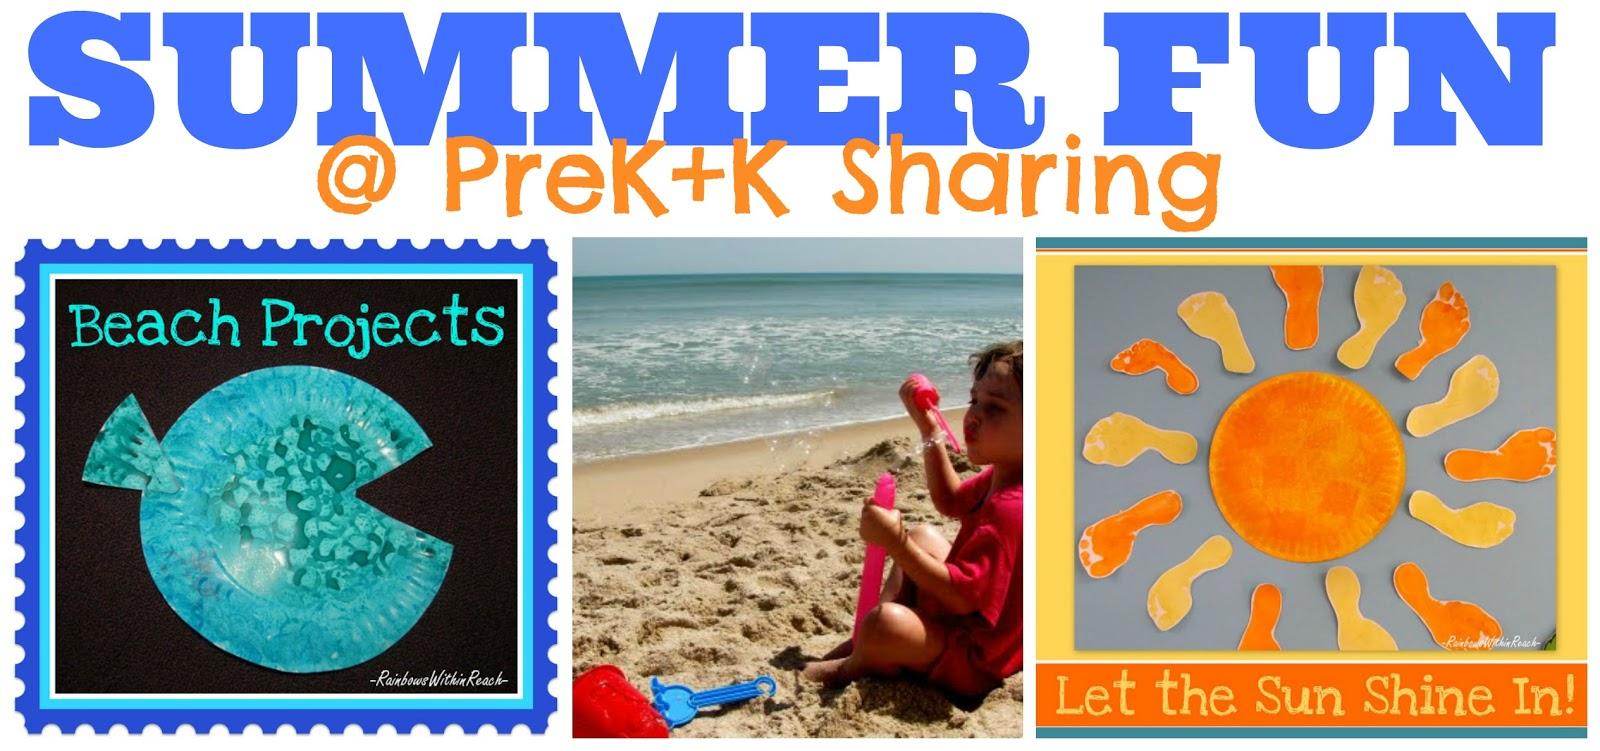 Pre k arts and crafts - Photo Of Summertime Fun Arts Crafts At Prek K Sharing